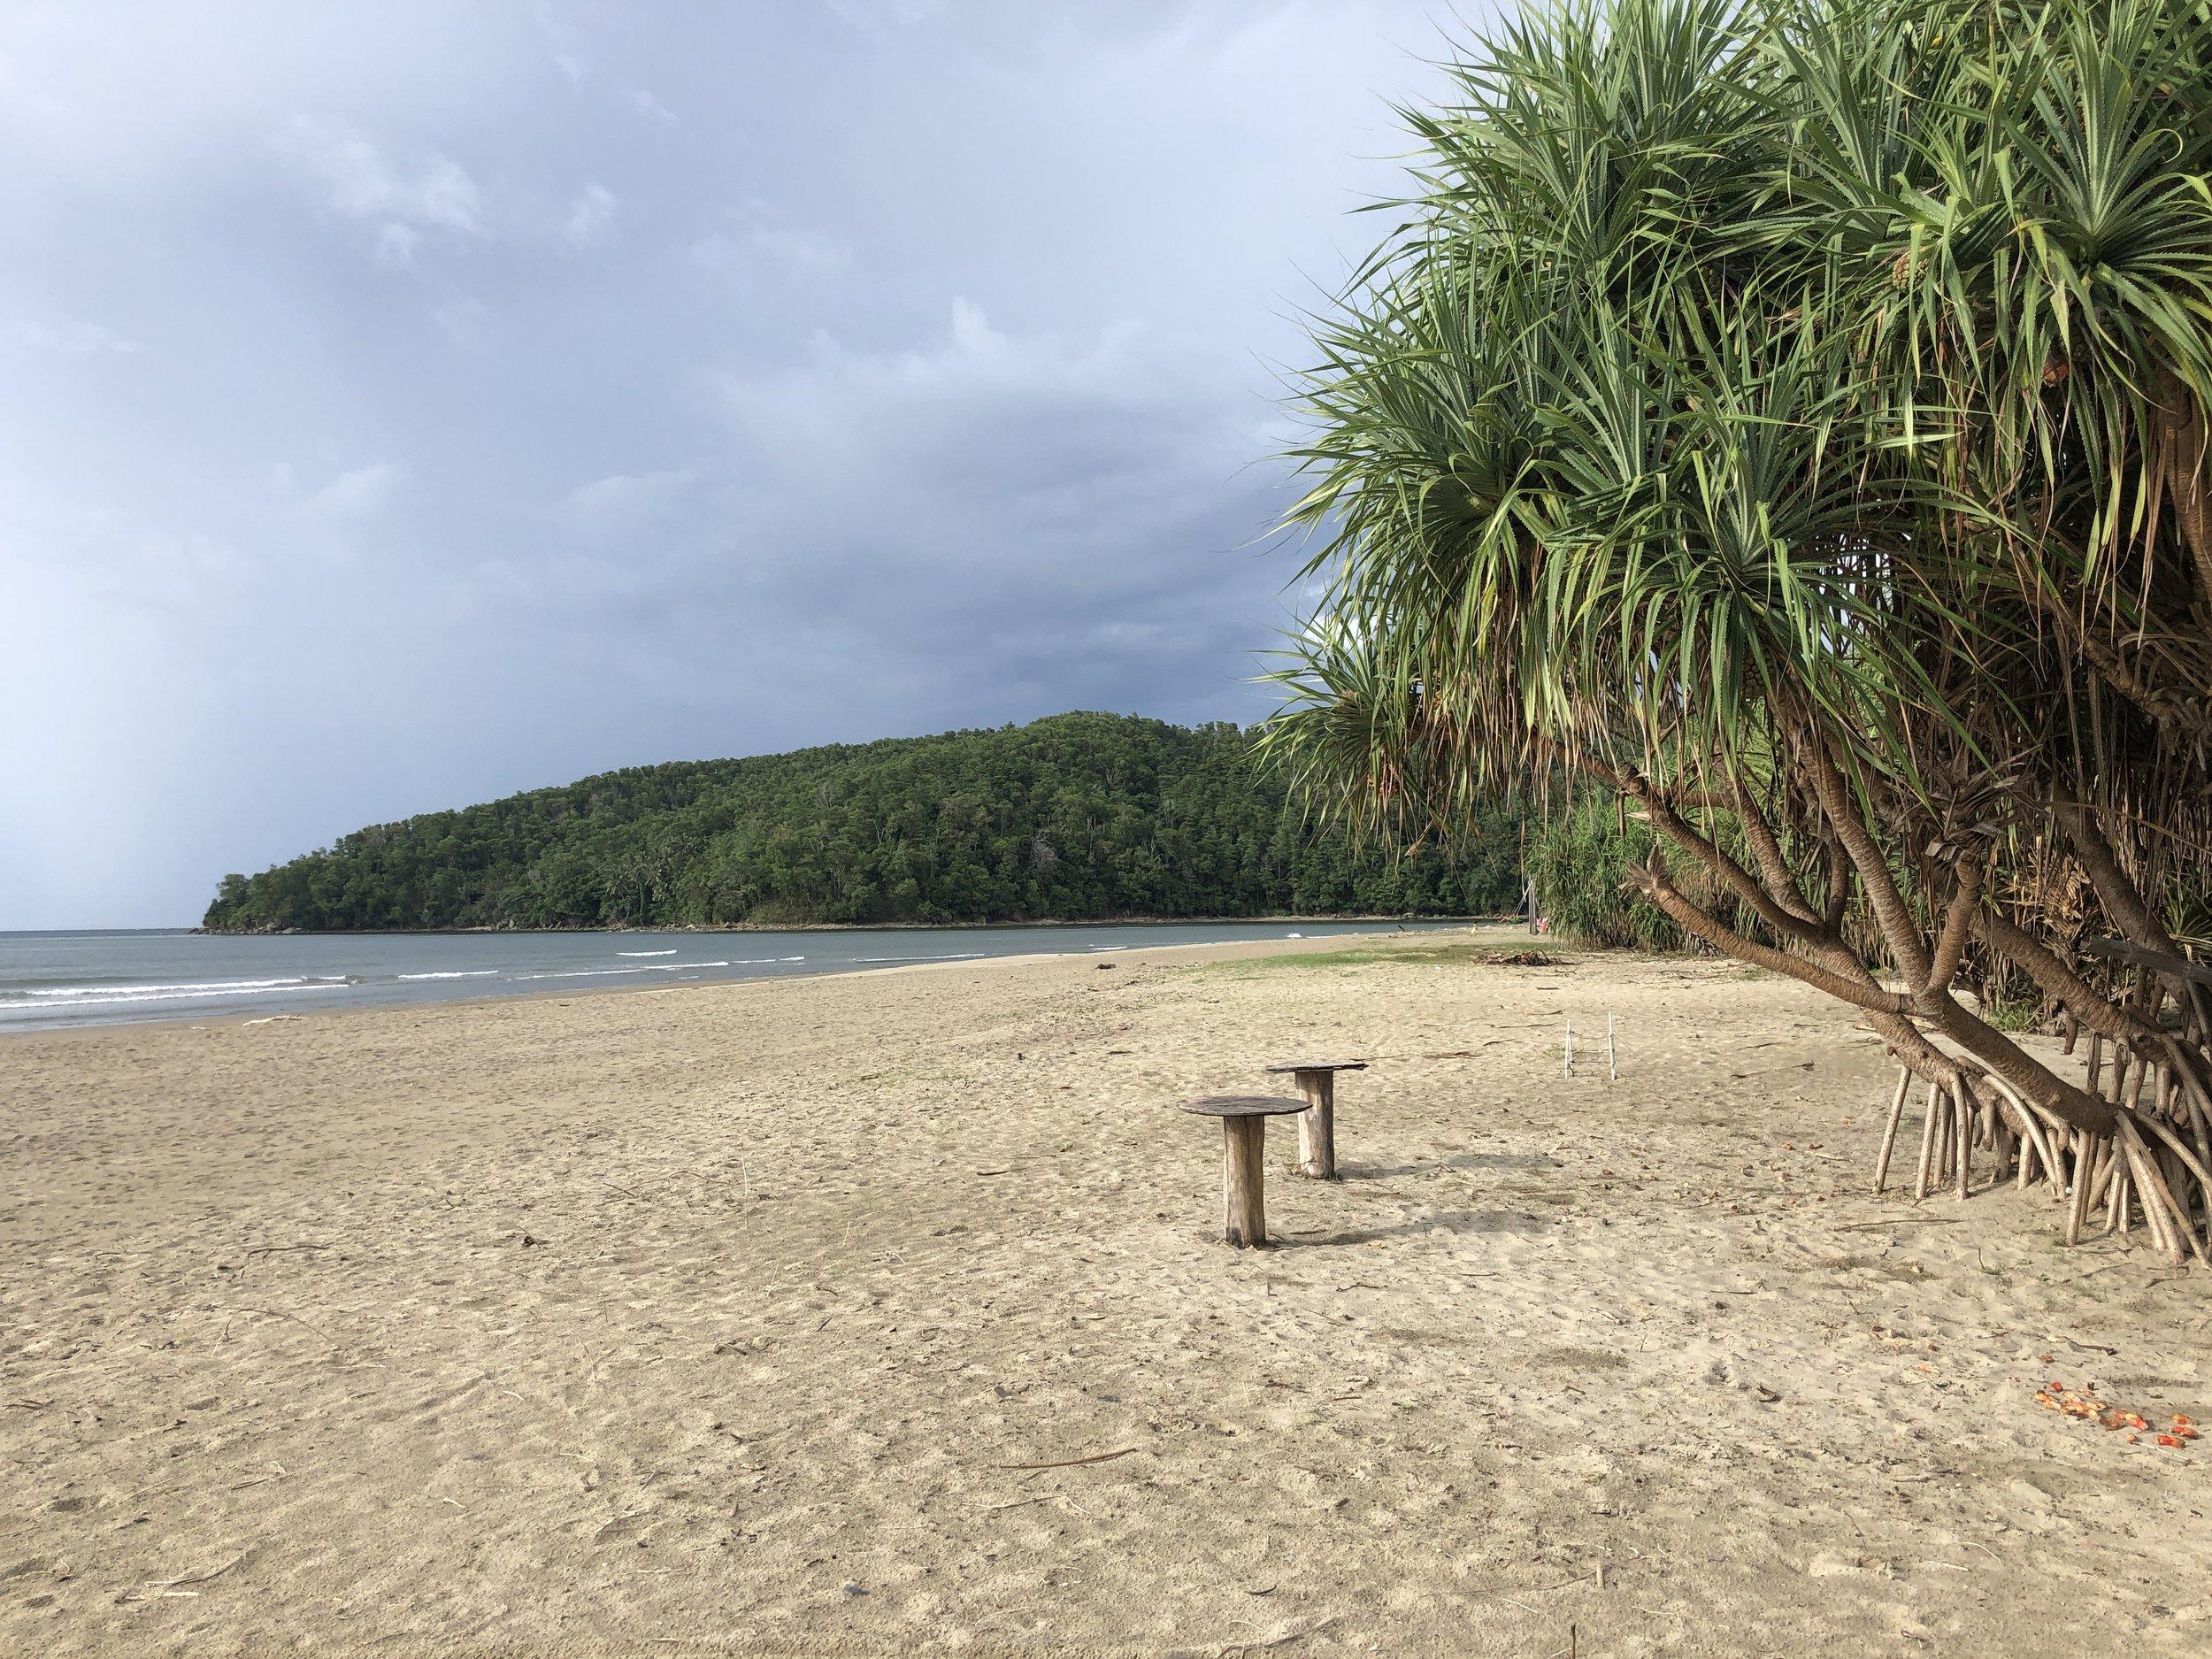 Habib Beach